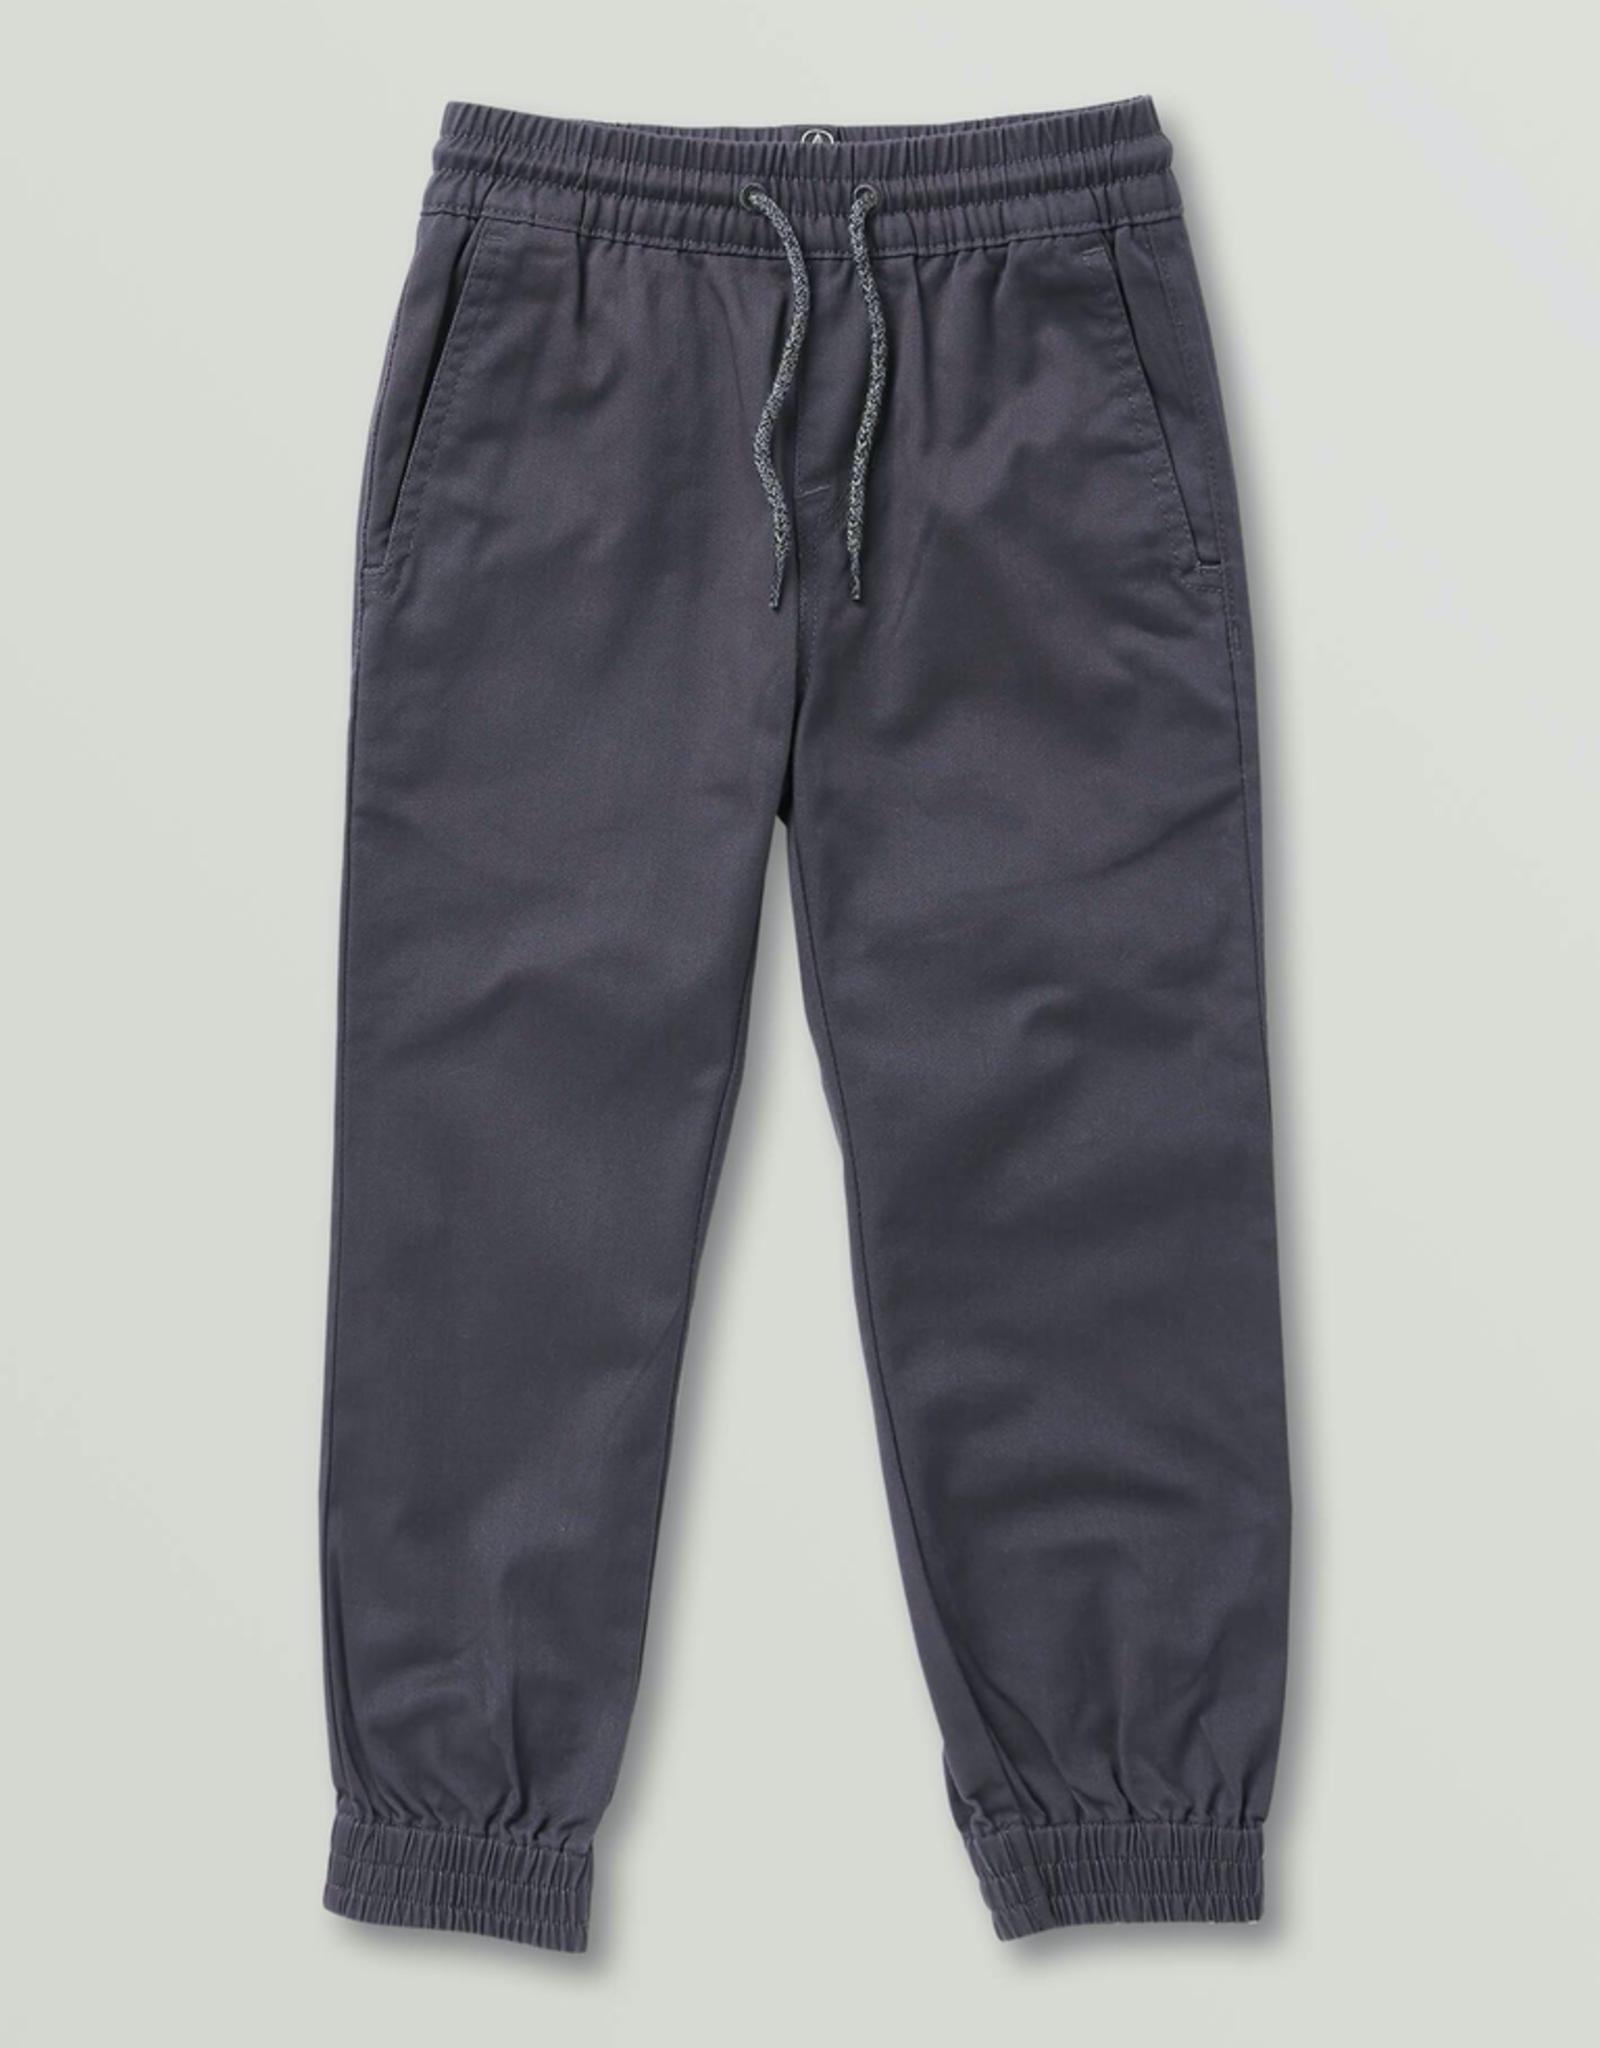 Little Boys Frickin Slim Jogger Pants -  Charcoal